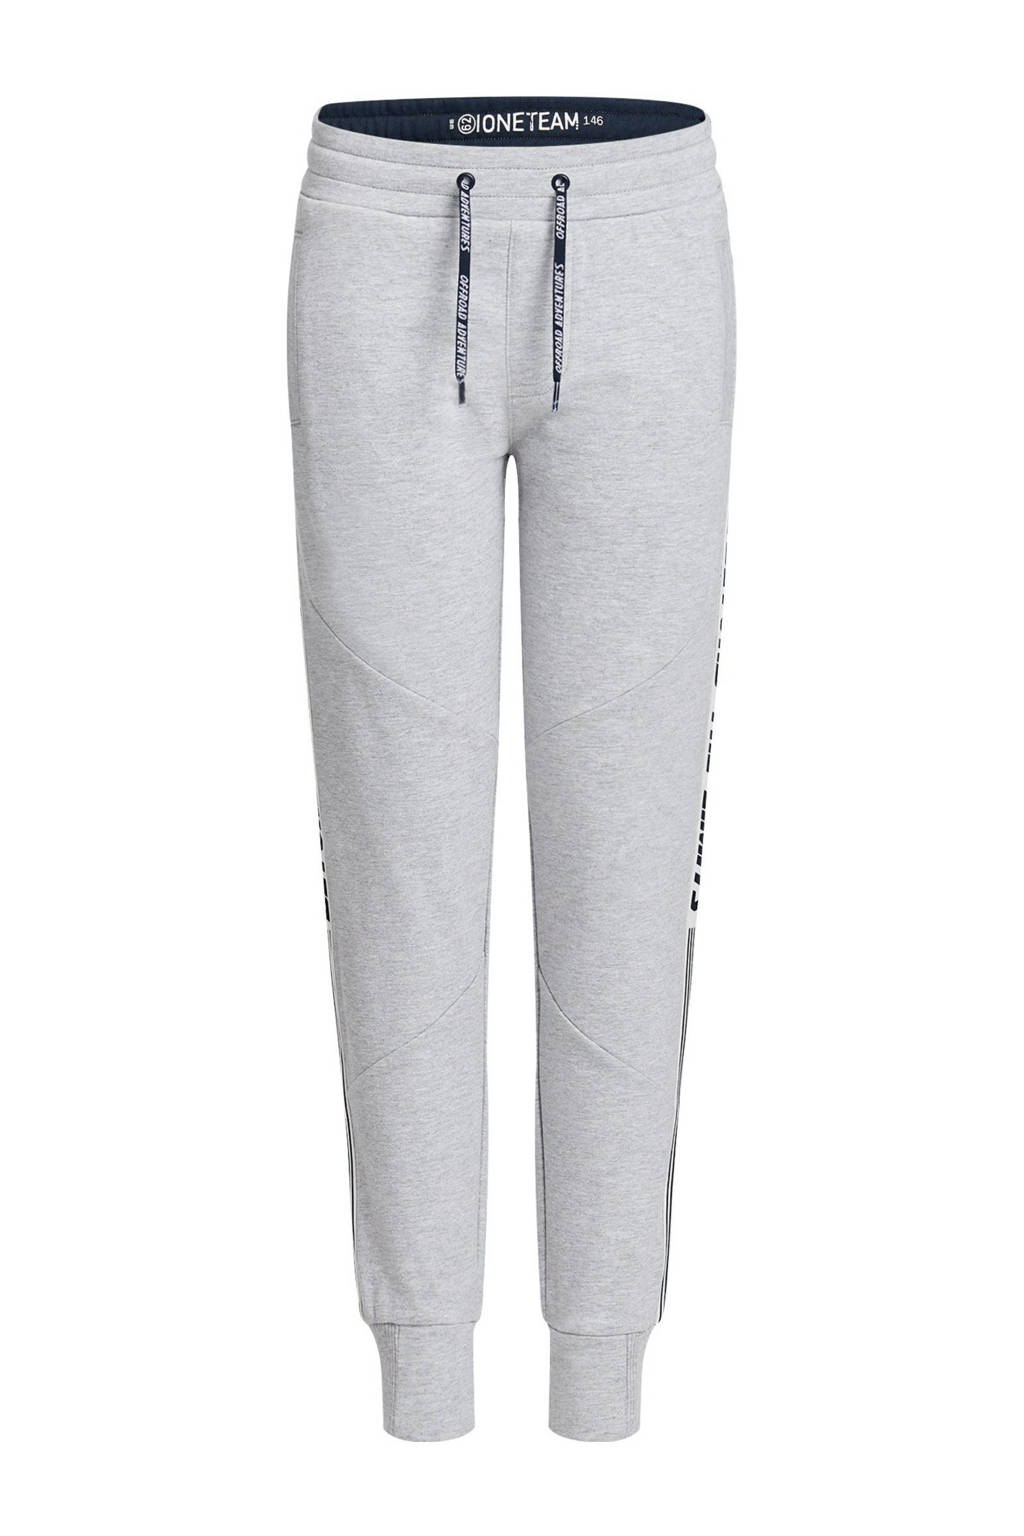 WE Fashion slim fit joggingbroek grijs melange/donkerblauw, Grijs melange